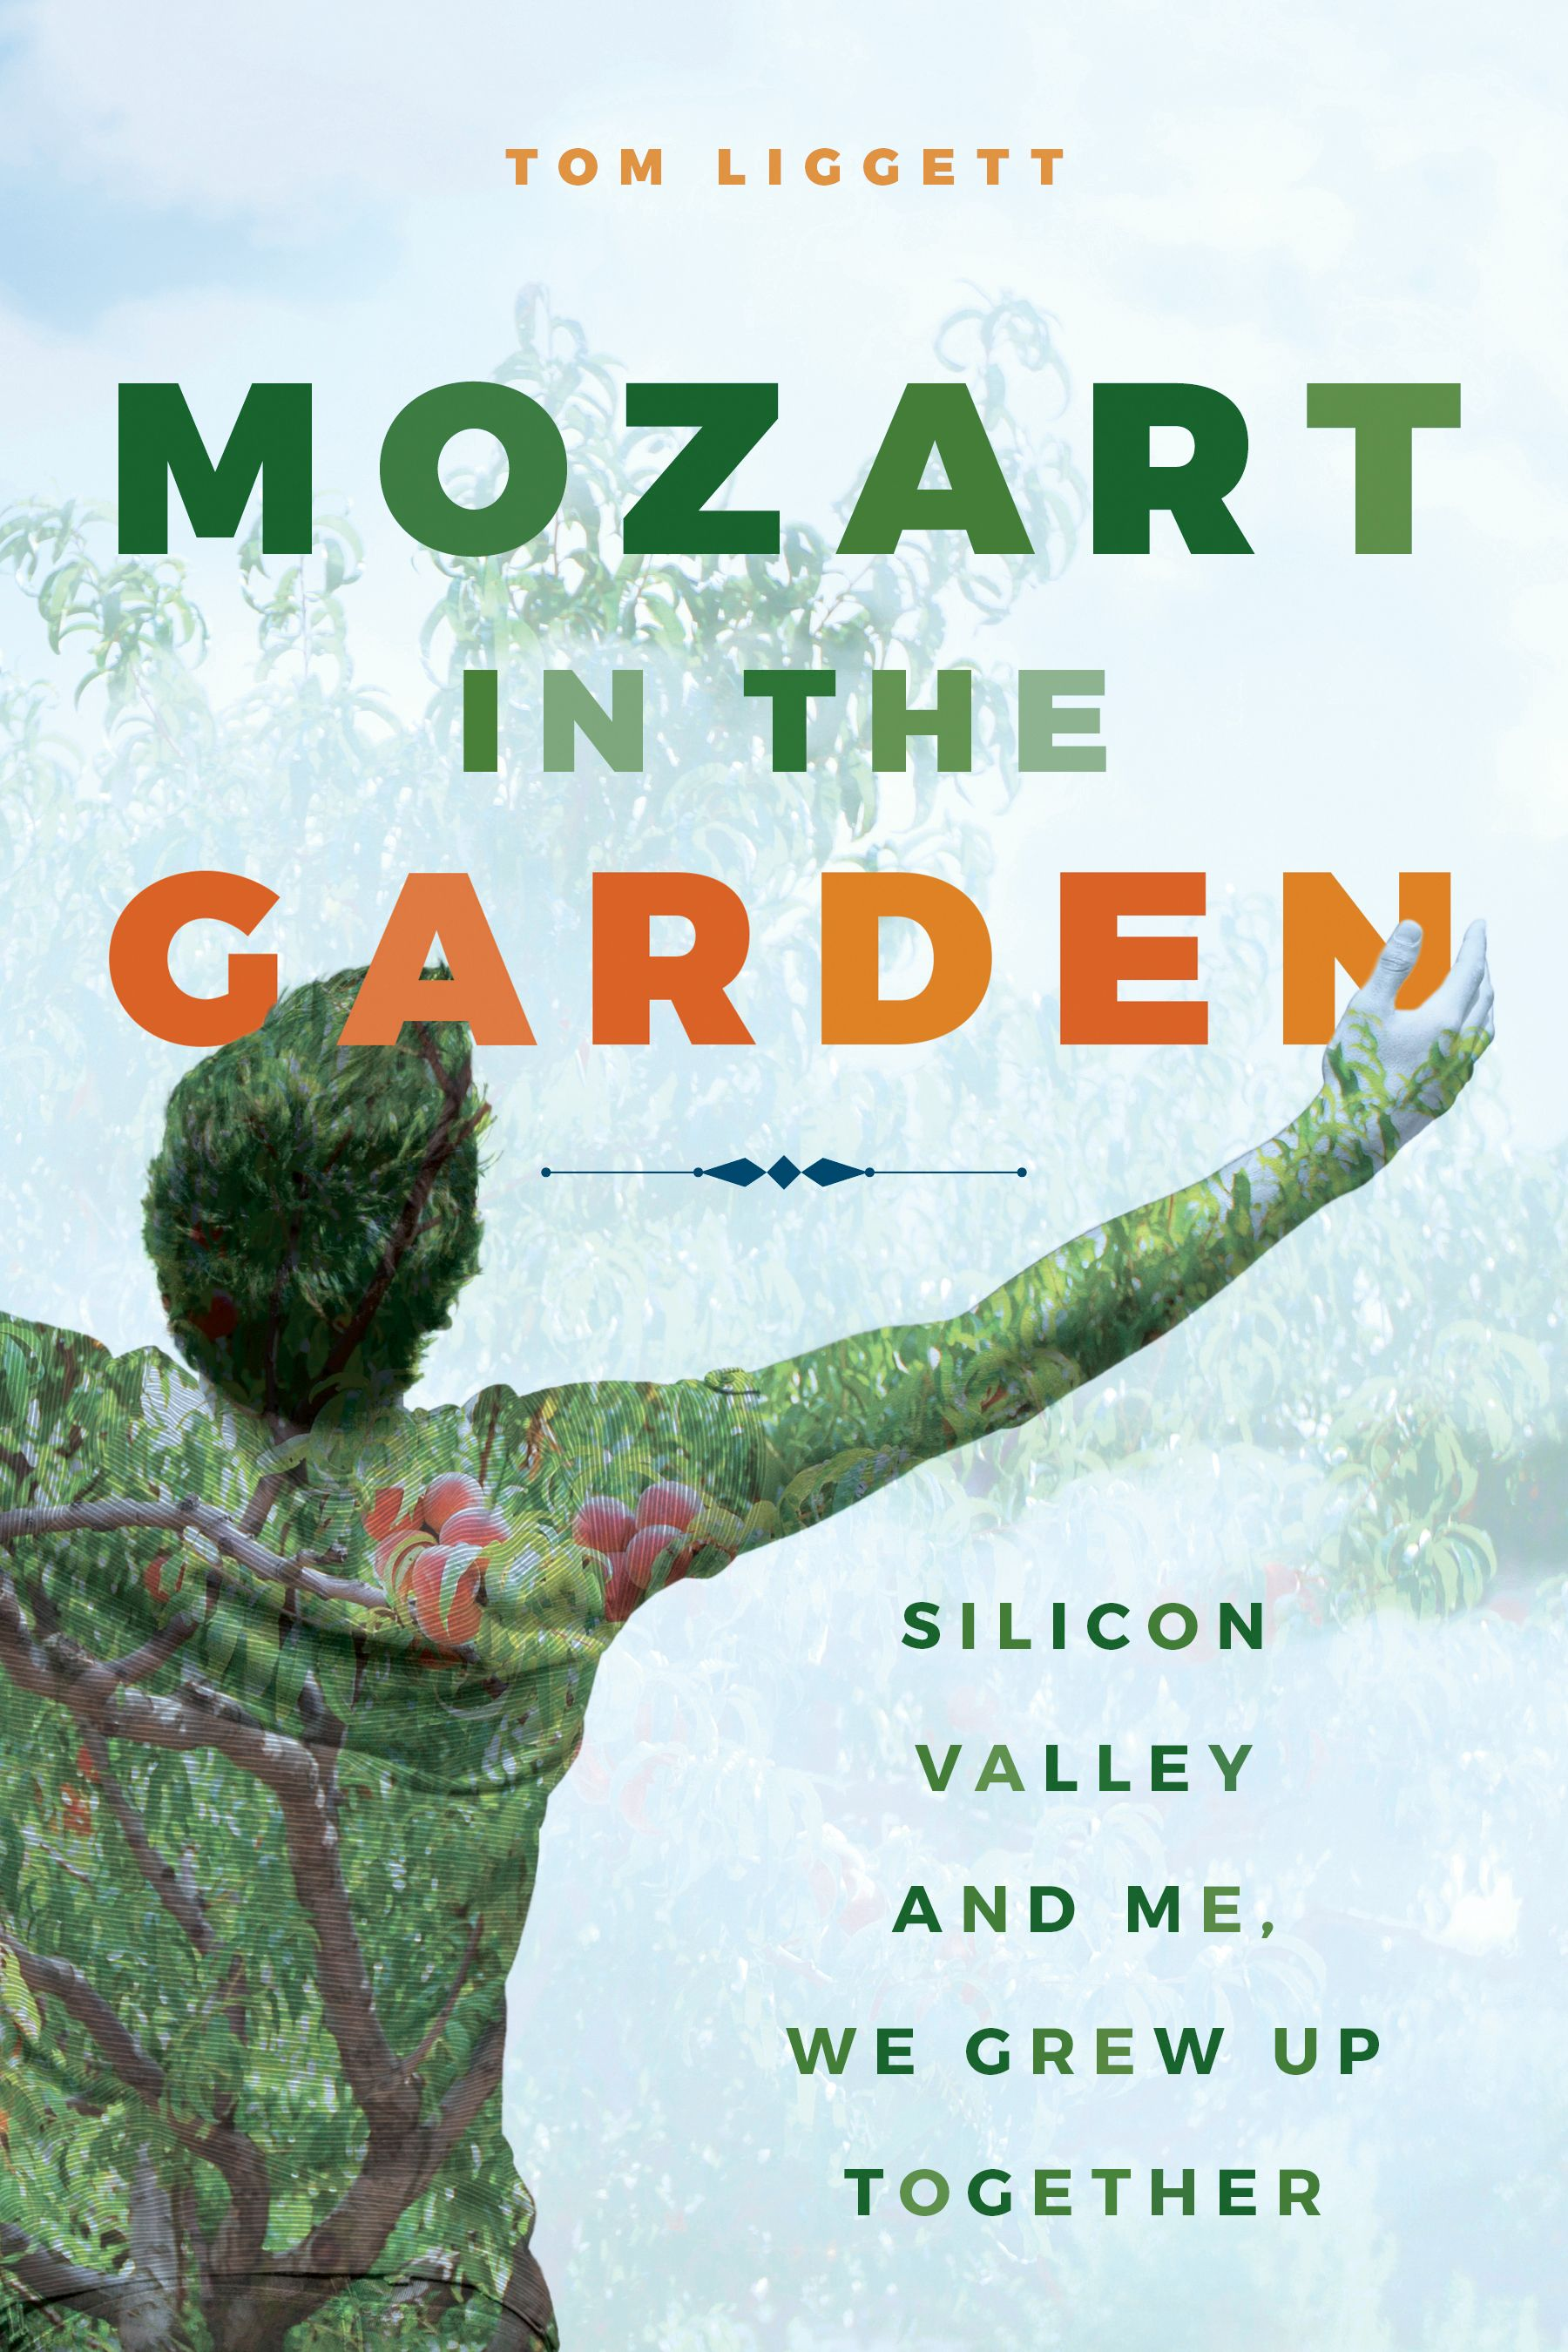 Mozart In The Garden Book Cover Design In 2020 Book Cover Design Cover Design Book Cover